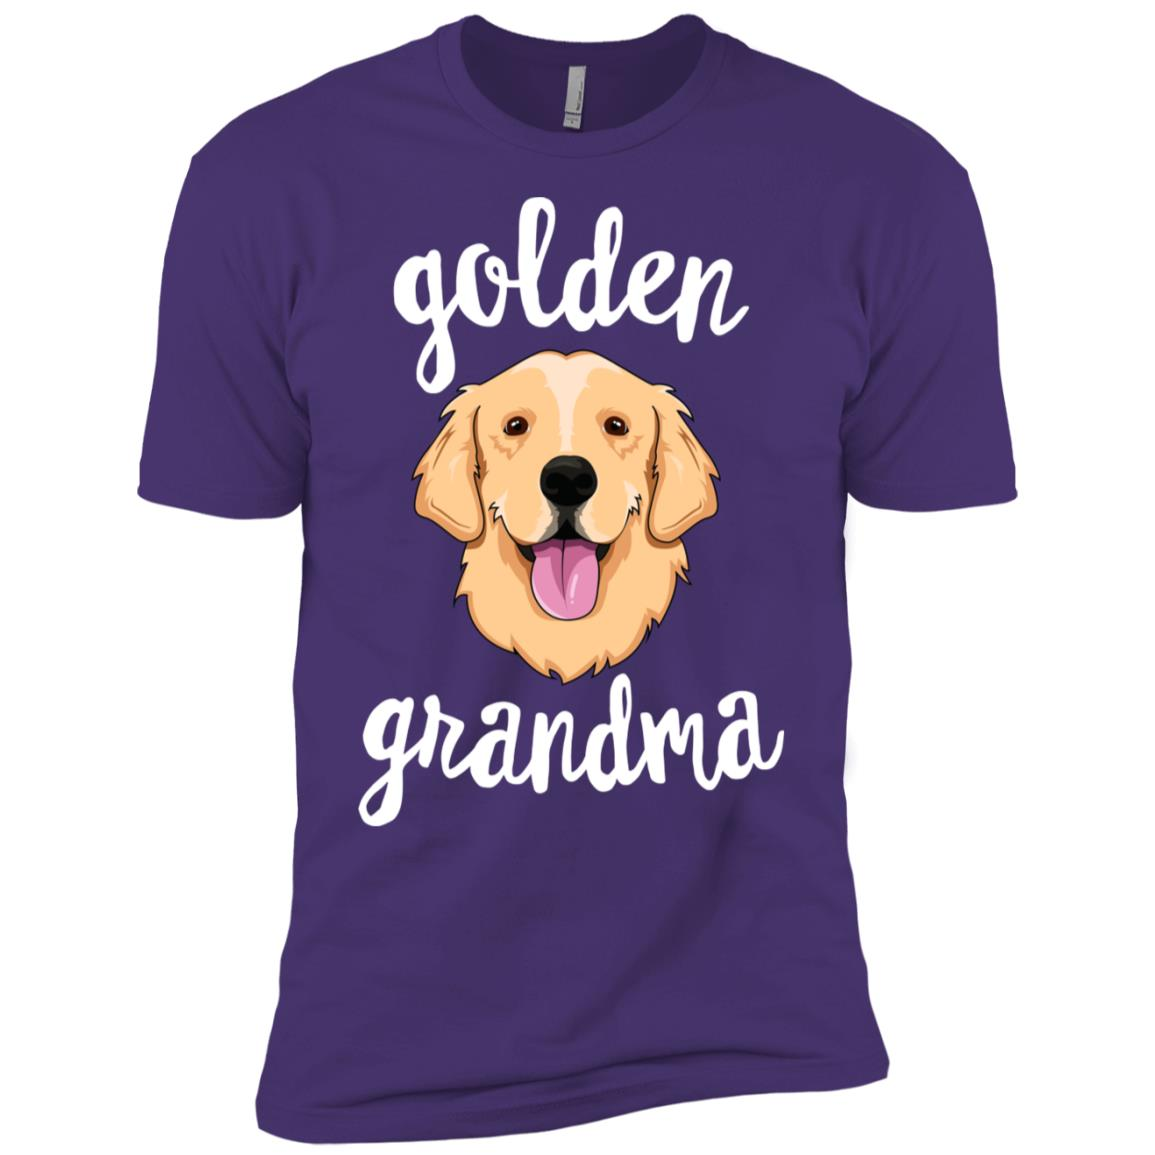 Golden Retriever Grandma Women Mom Dog Men Short Sleeve T-Shirt